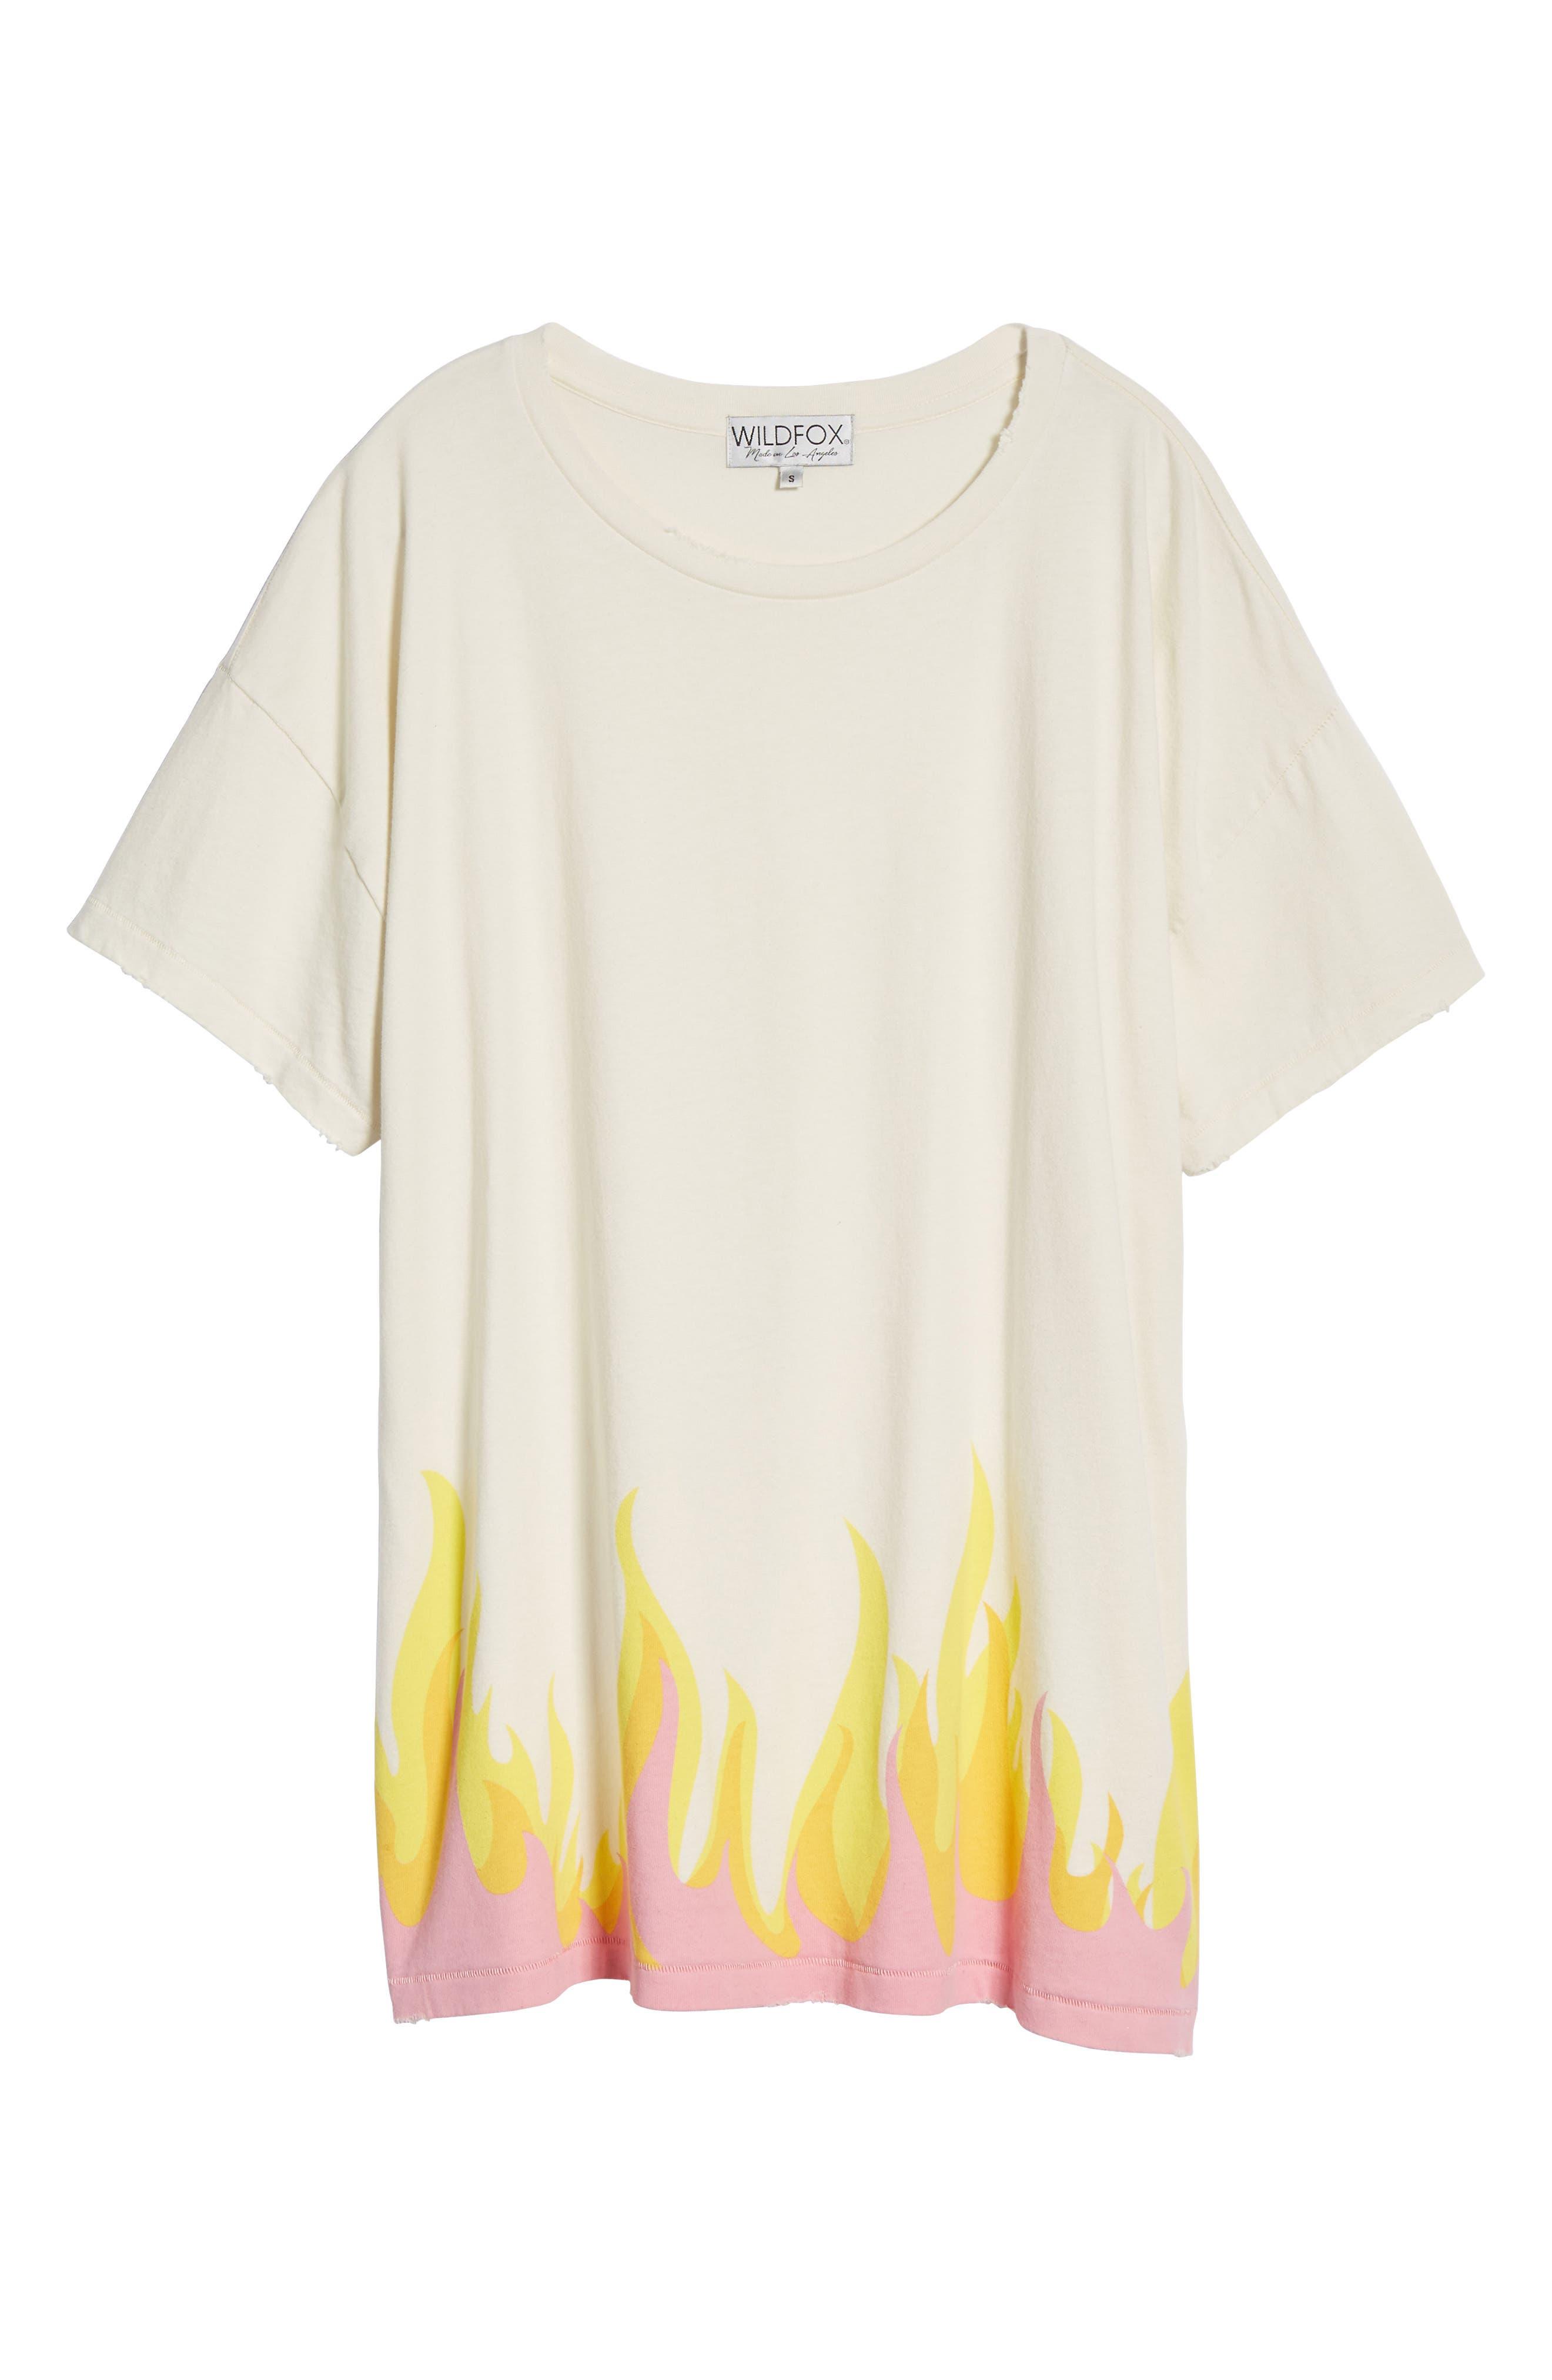 Wildfire T-Shirt Dress,                             Alternate thumbnail 6, color,                             901